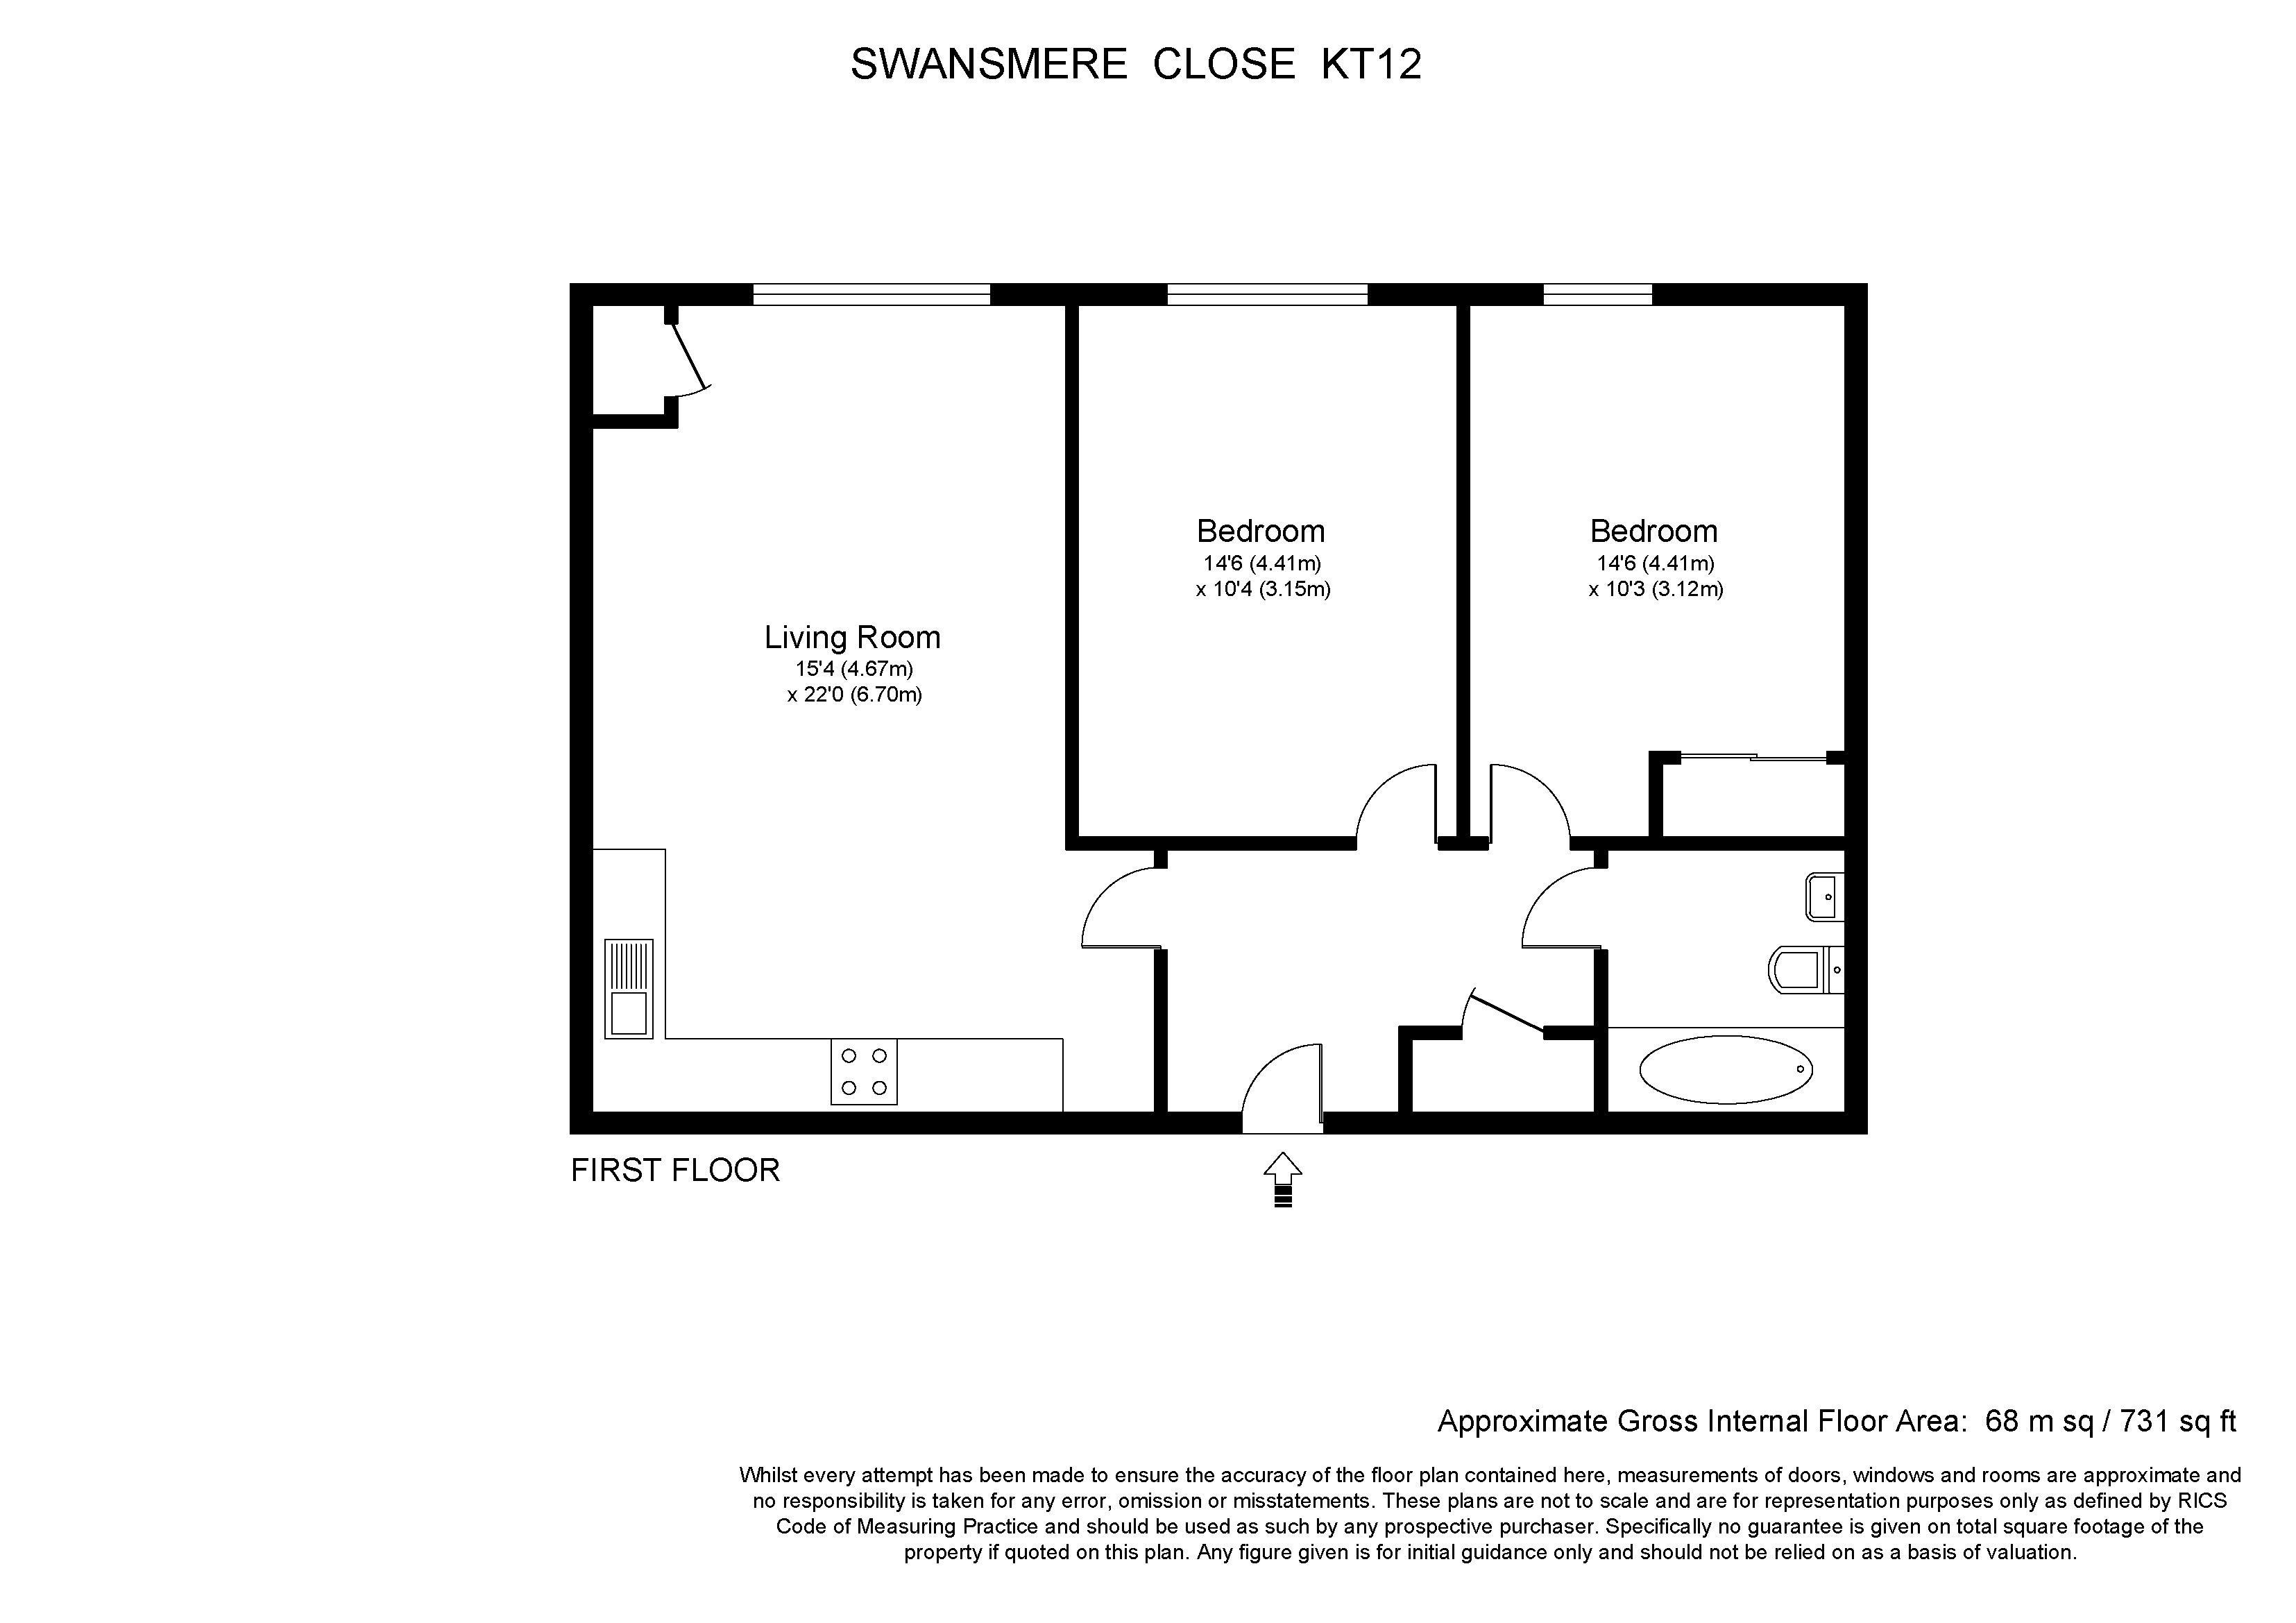 Swansmere Close